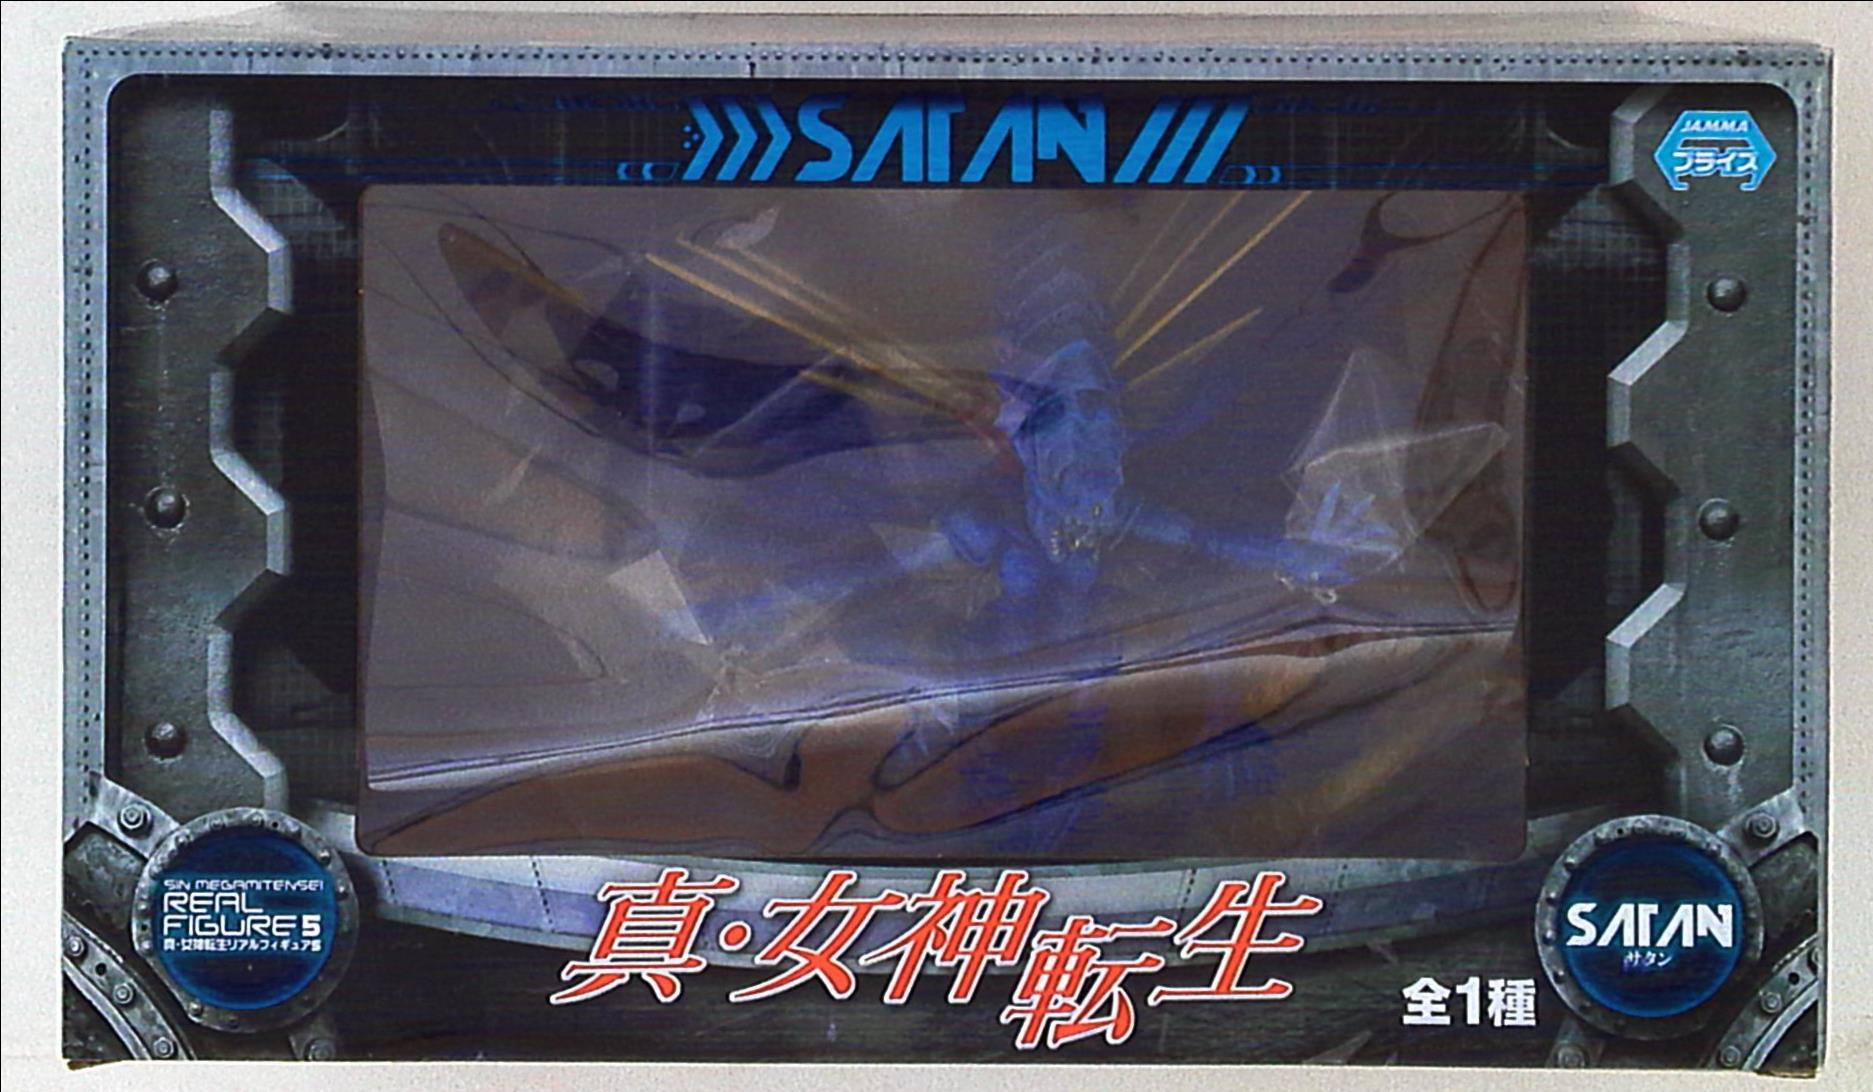 Shin Megami Tensei Real Figure 5 Satan FuRyu FROM JAPAN